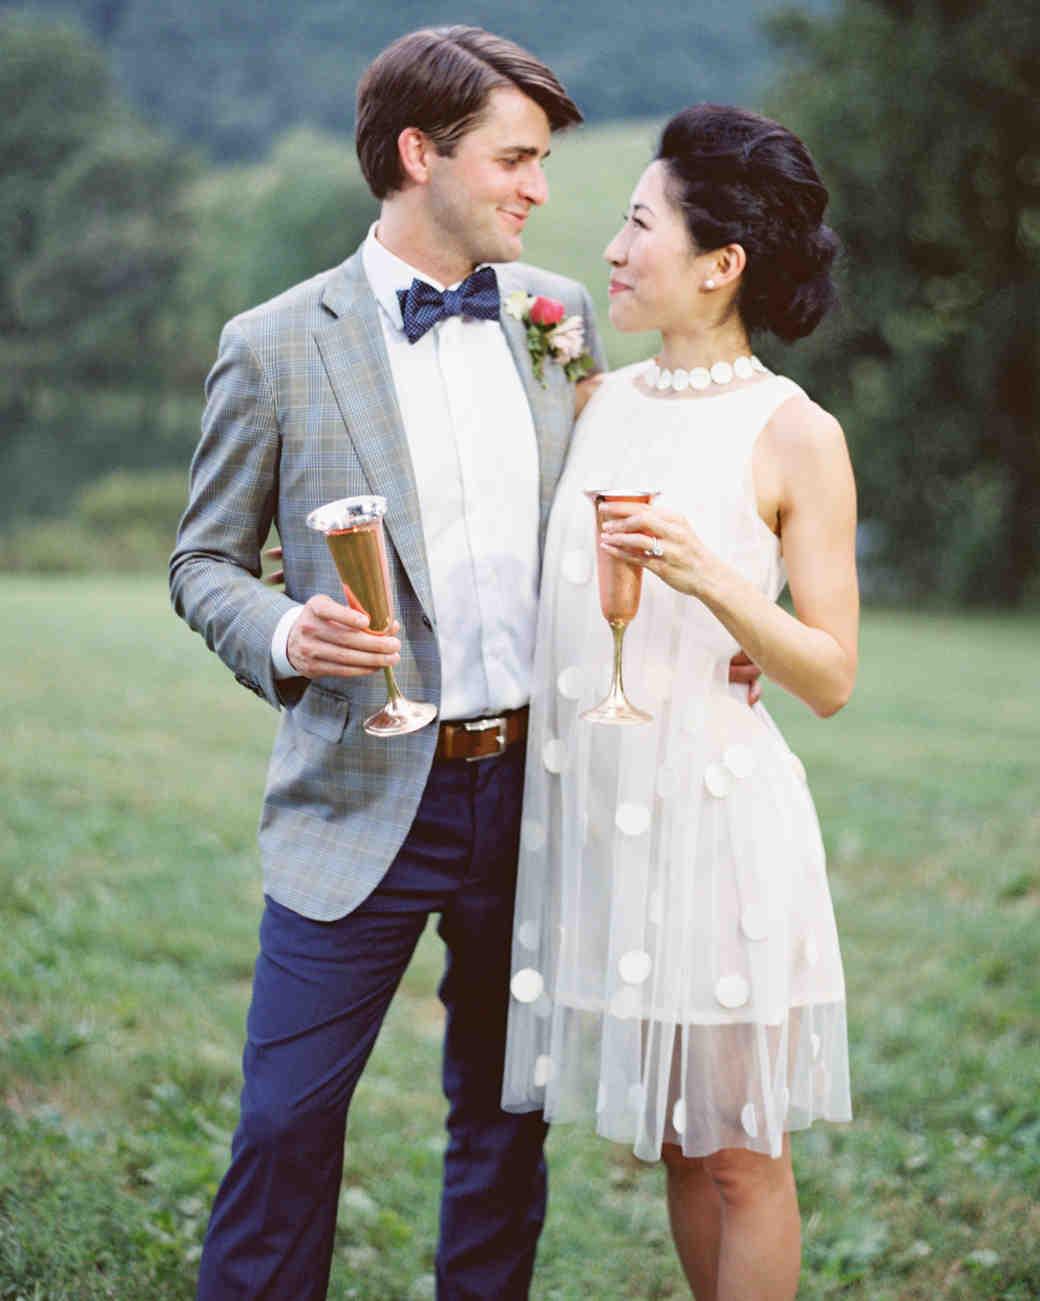 michelle-john-wedding-north-carolina-1-s111840-0215.jpg